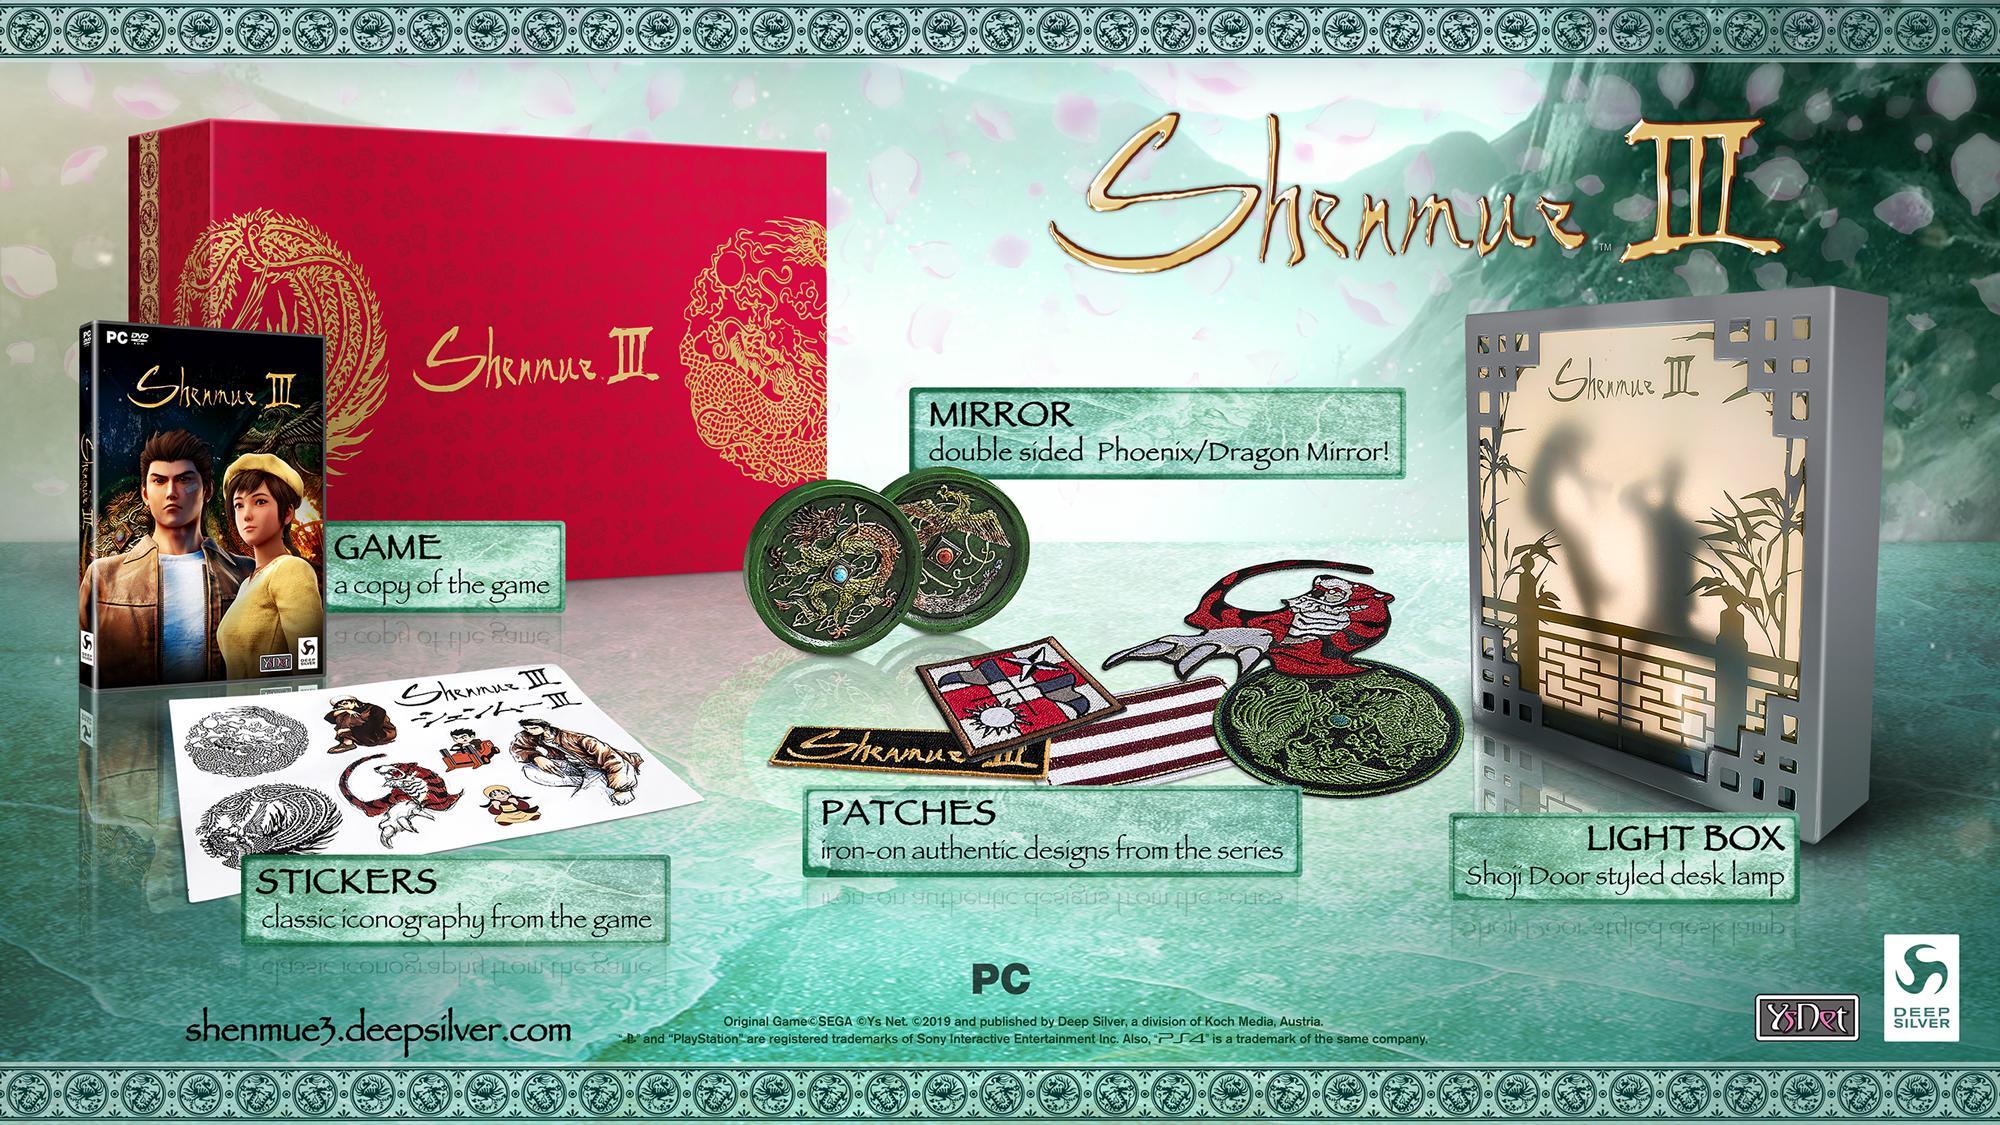 Shenmue-III-CE-LRG 06-10-19